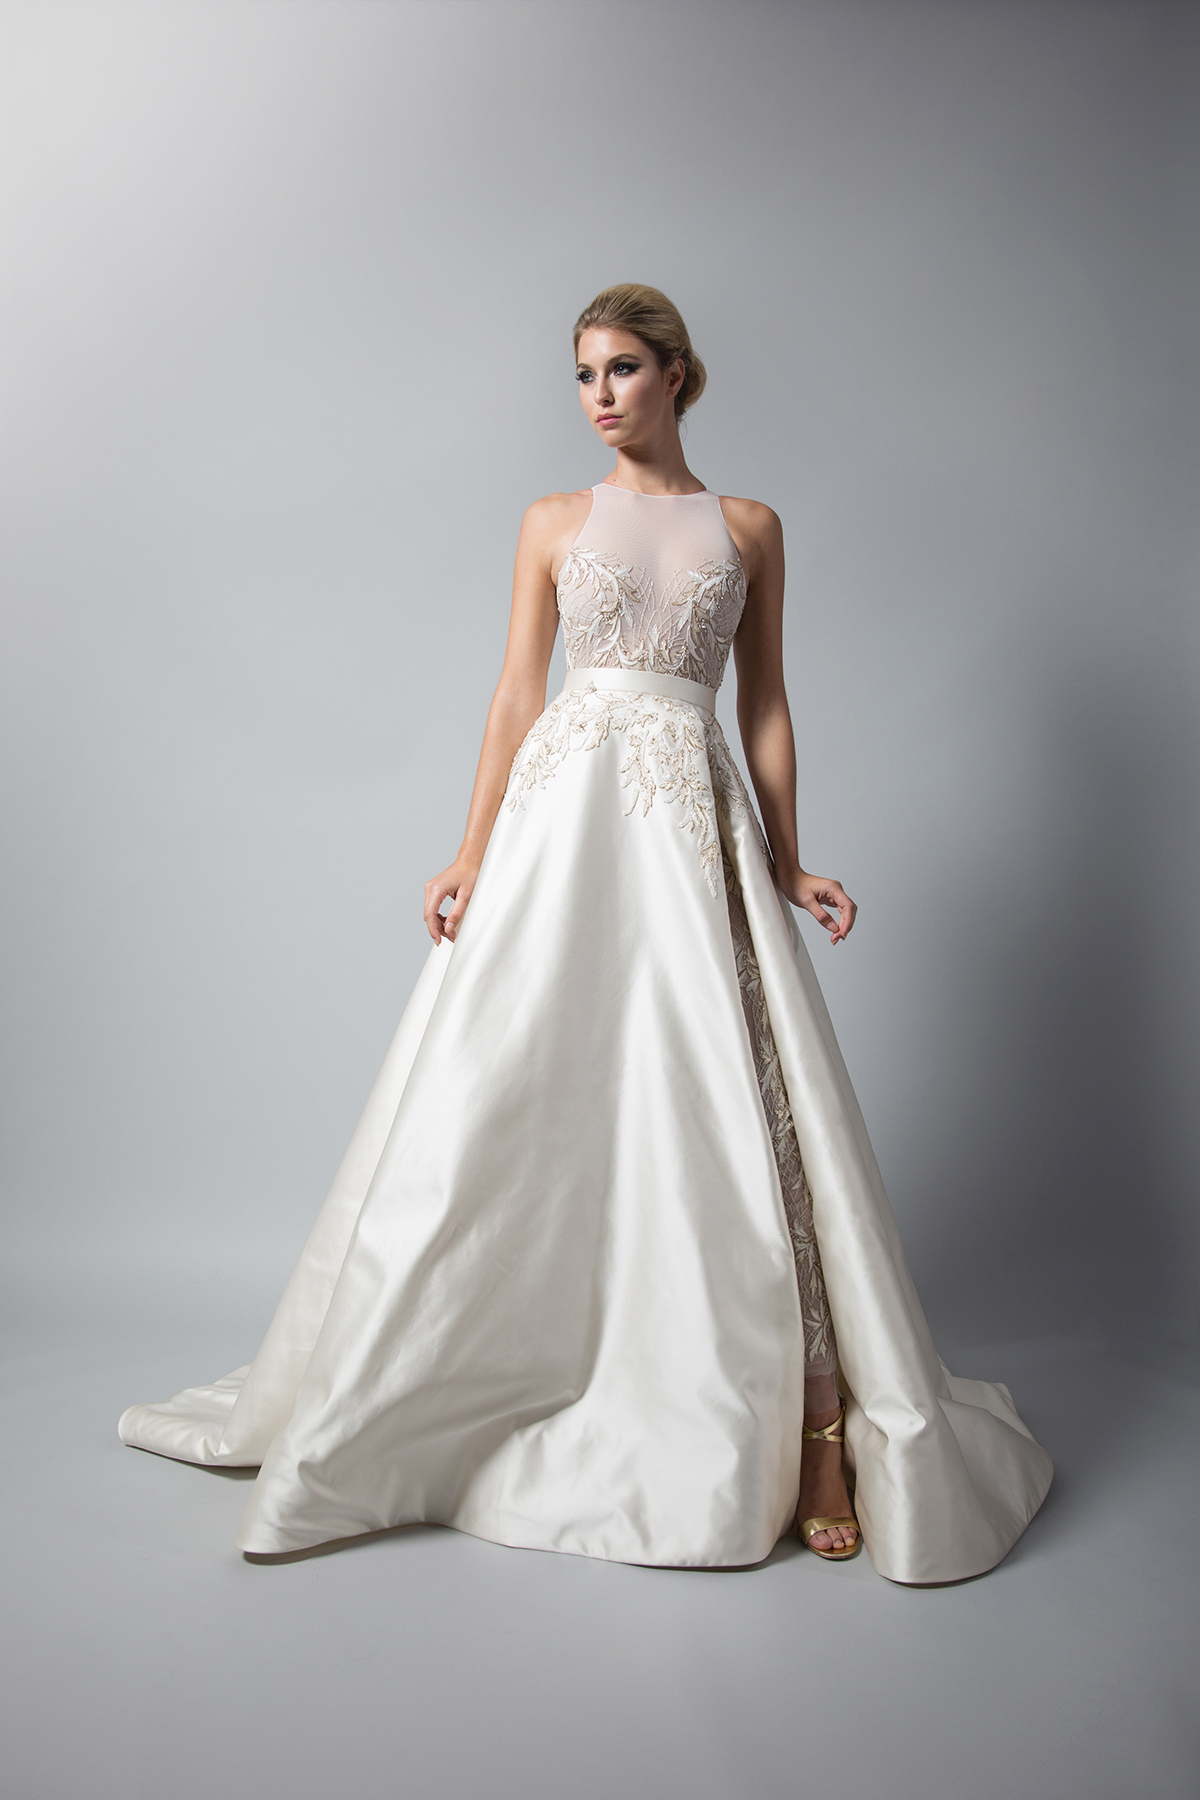 randi rahm high neck a-line wedding dress fall 2018